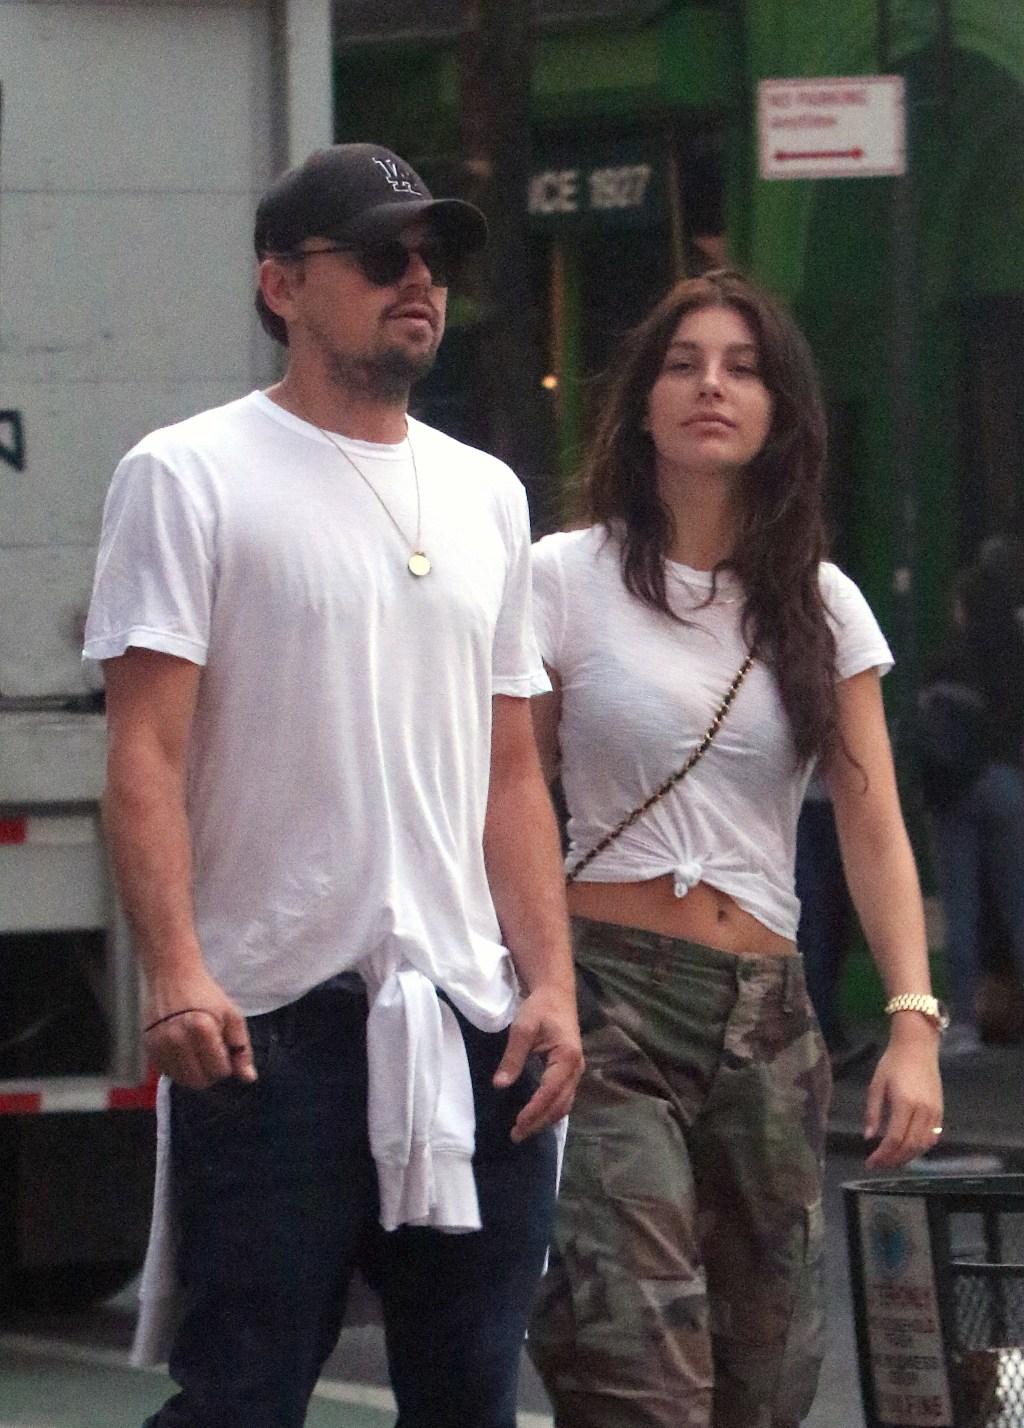 Leonardo DiCaprio, girlfriend Camila Morrone